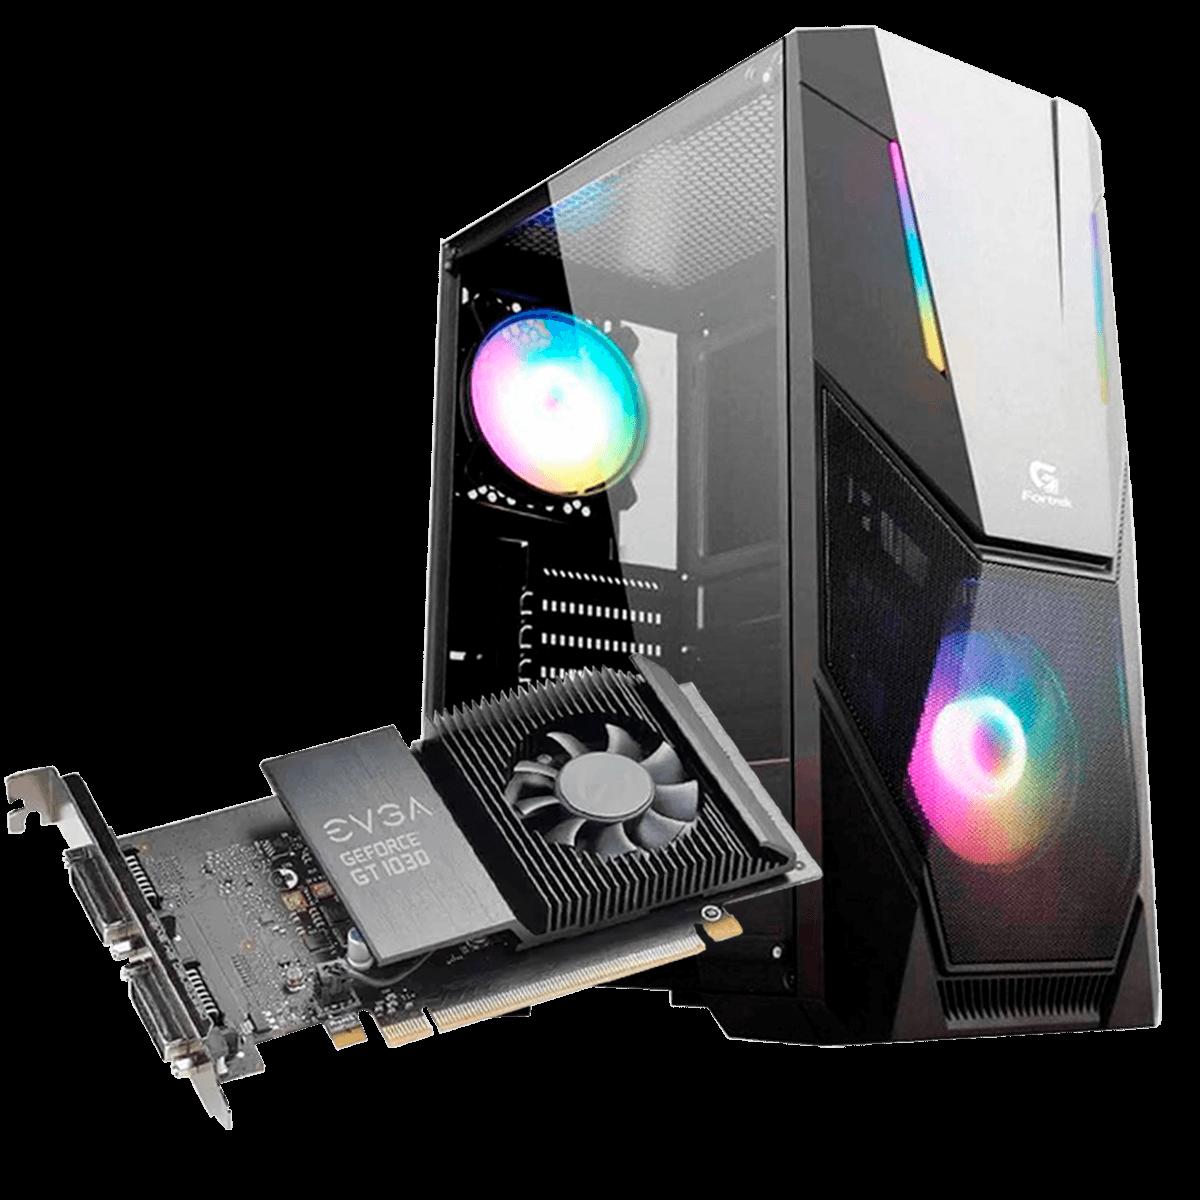 Computador Gamer Infohard Intel I3-9100F,8 GB DDR4, 240GB SSD, GT1030 2GB, 500W, H310M-E R2.0/BR - 634760